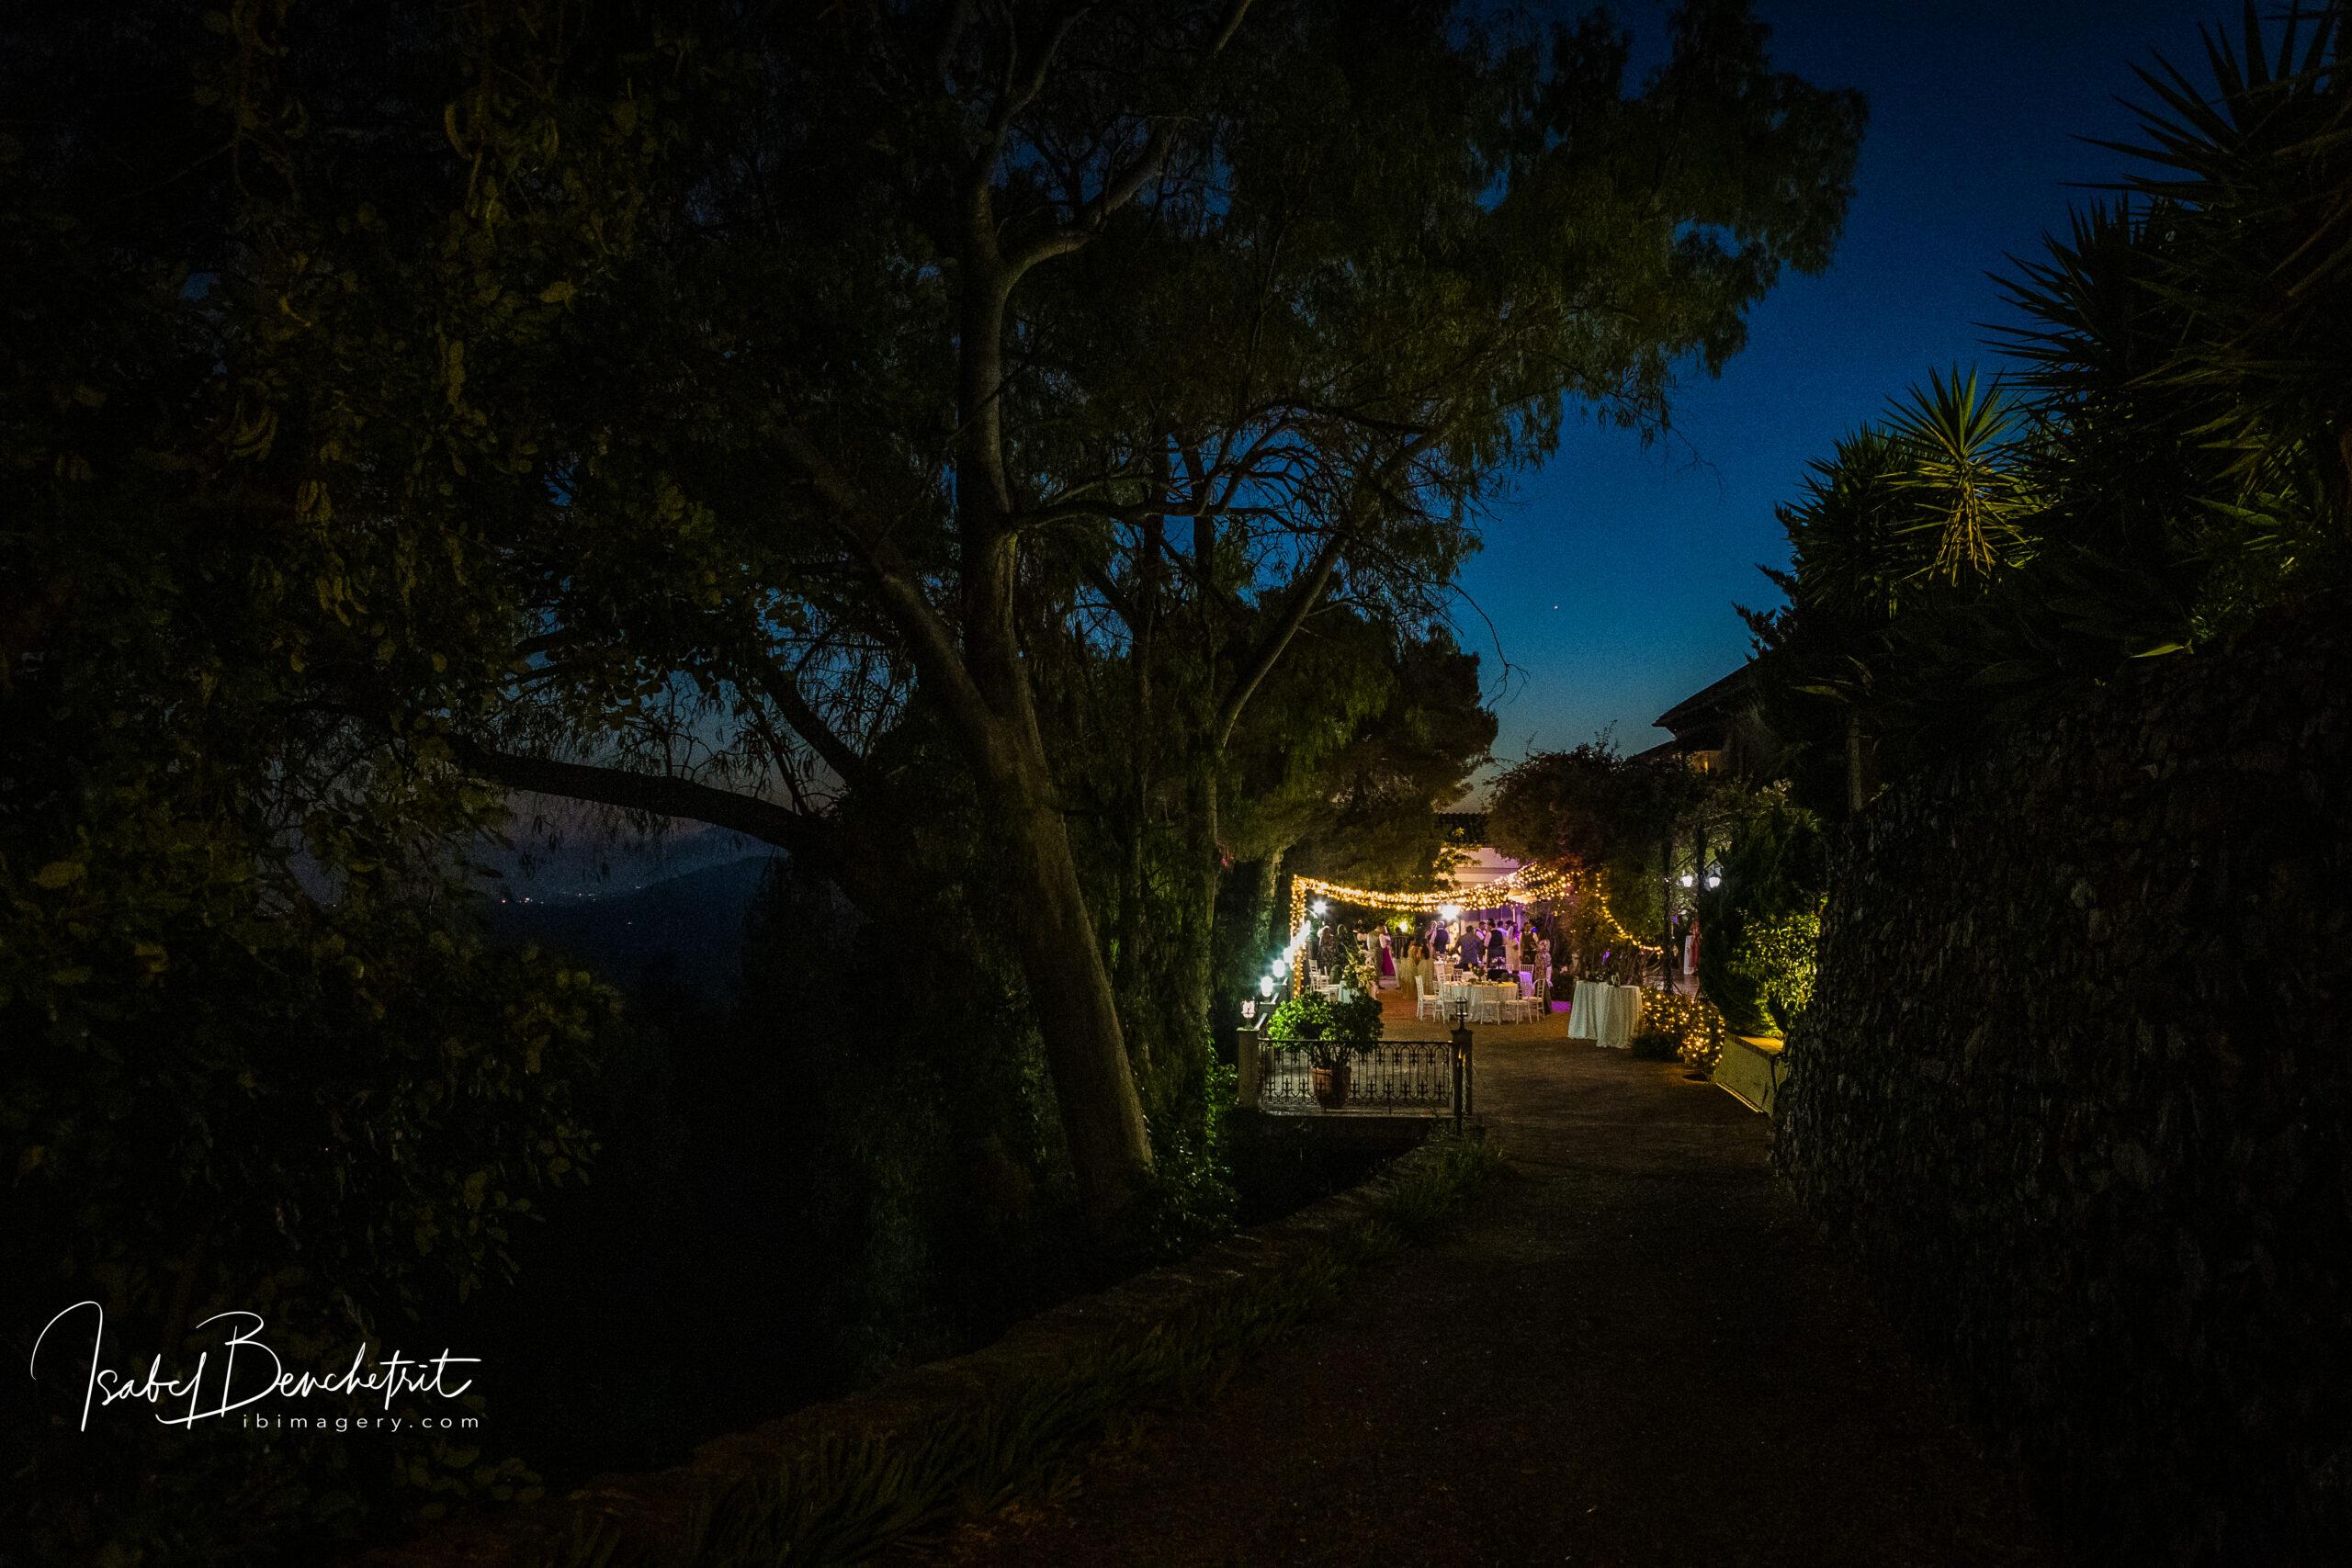 The stunning wedding venue at night